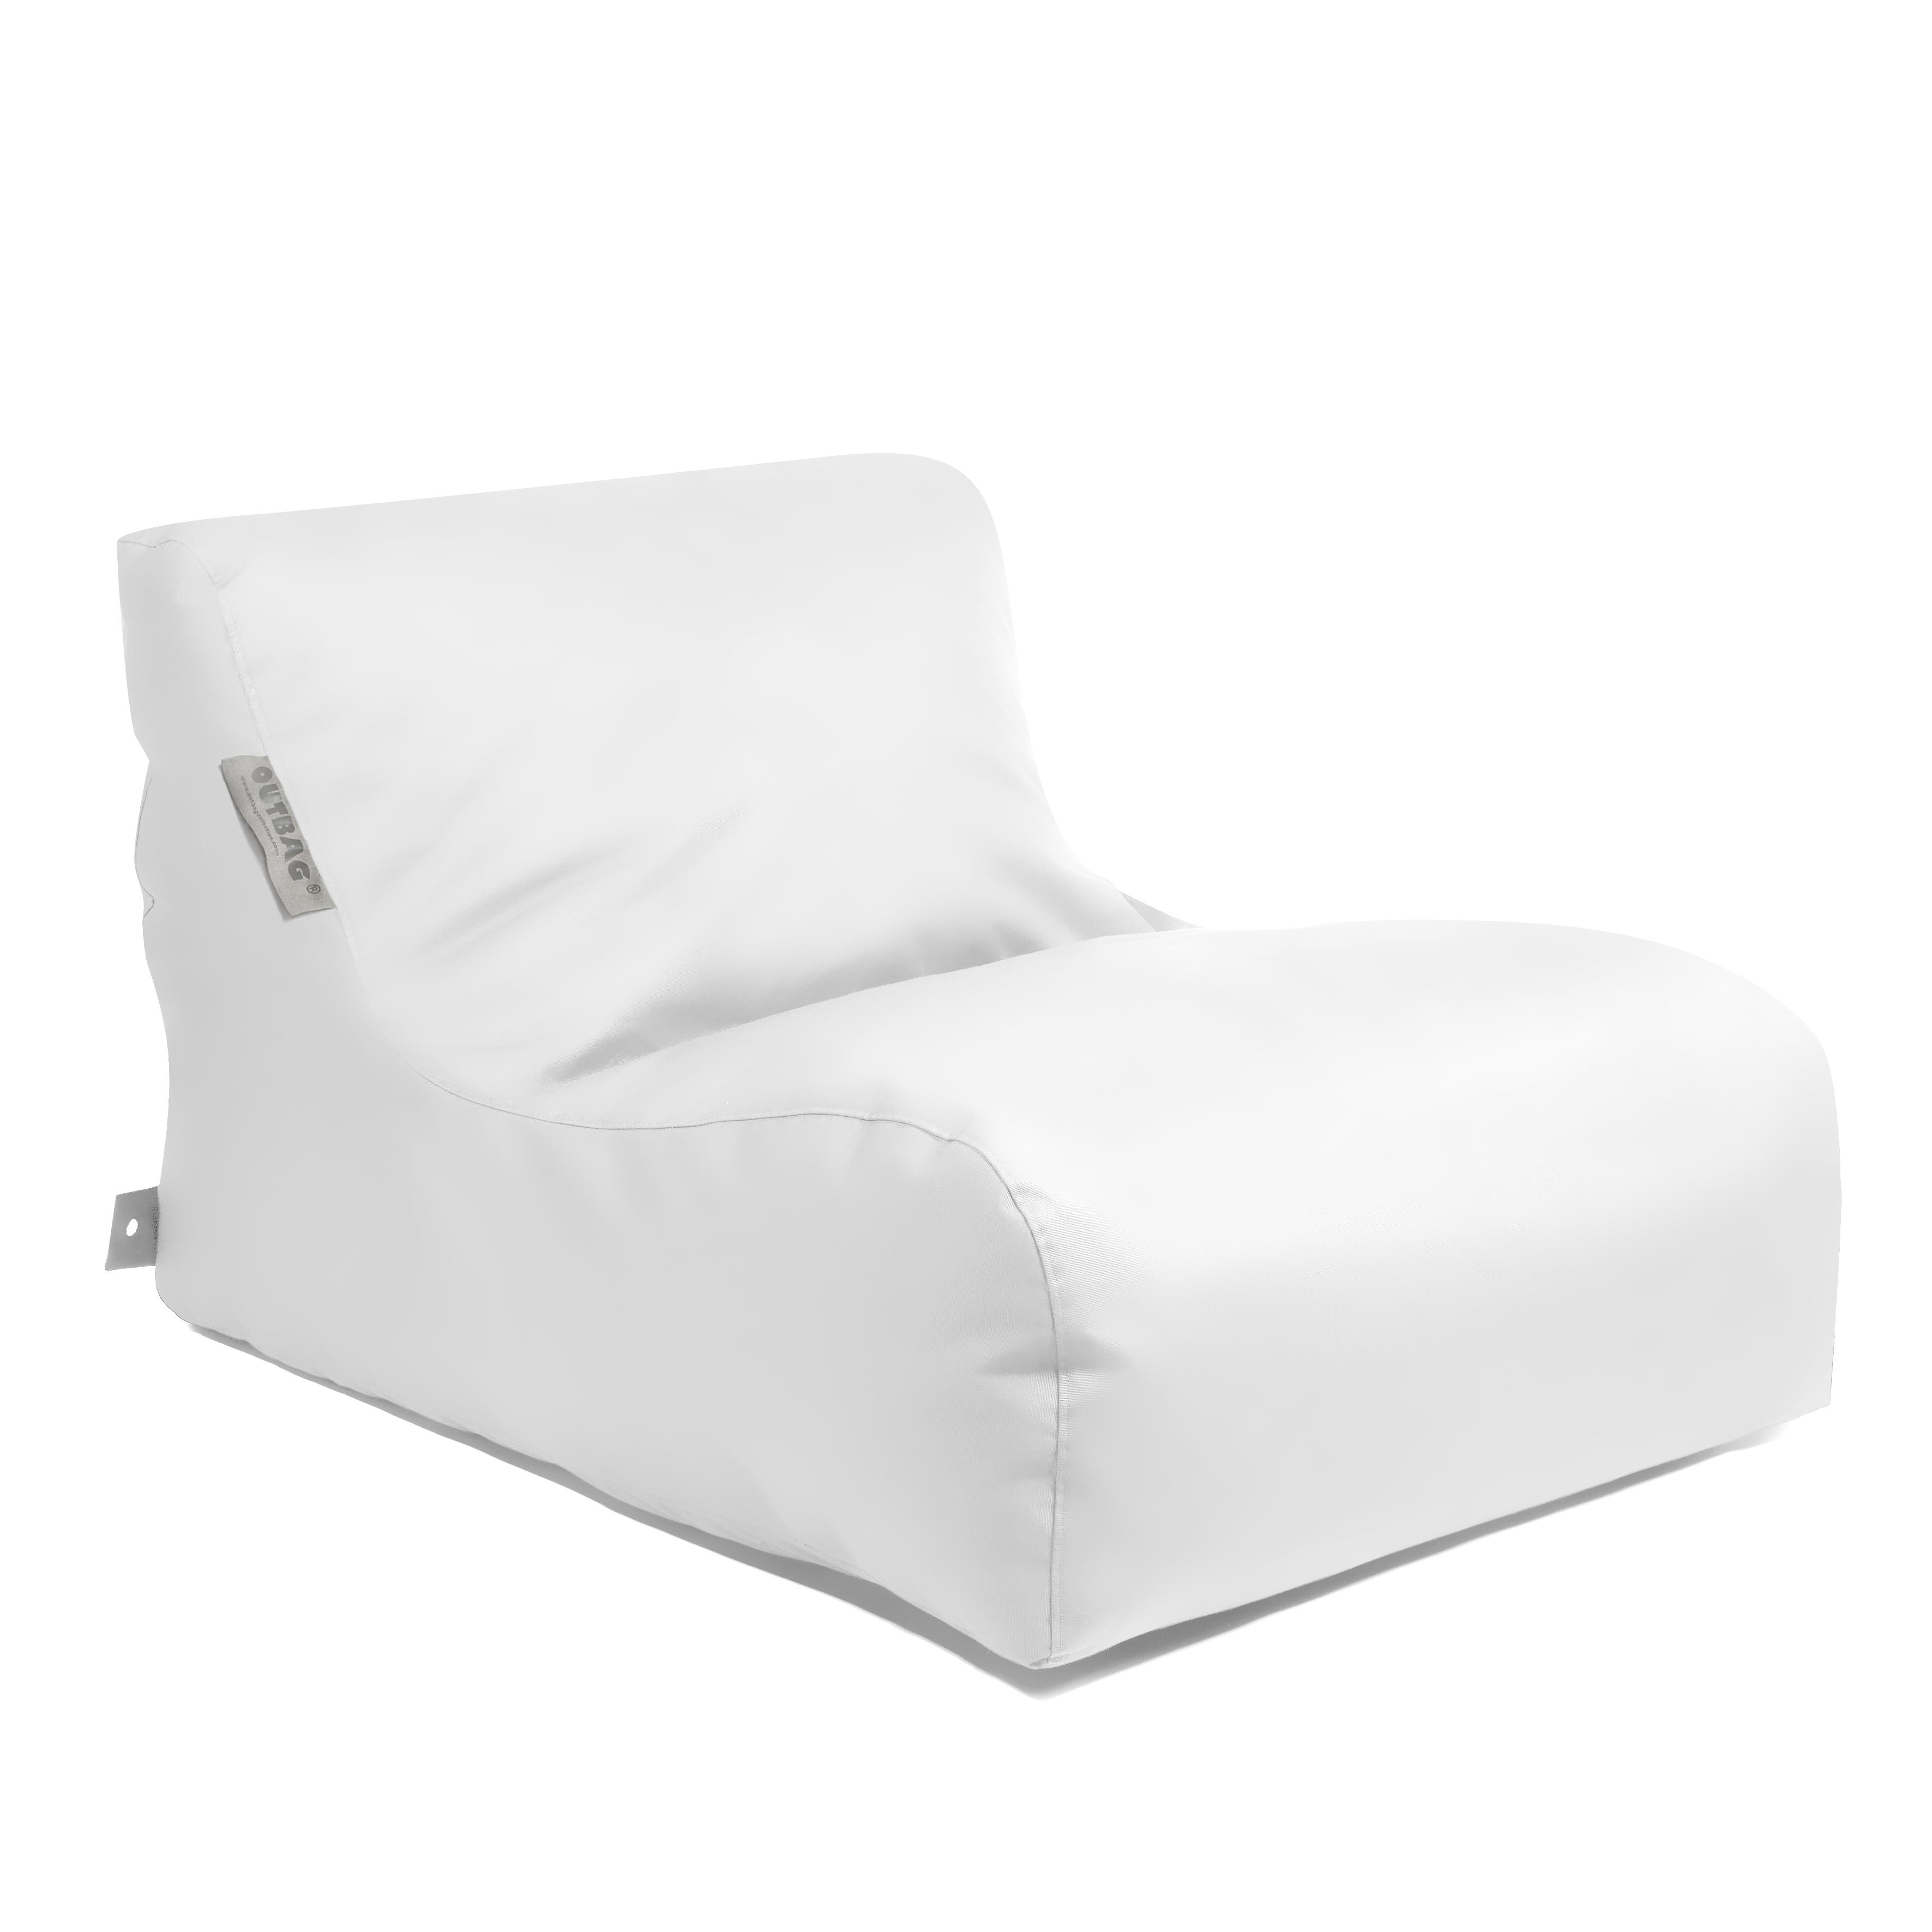 outbag outdoor sitzsack newlounge 120 x 90 cm wetterfest gartenm bel lounge ebay. Black Bedroom Furniture Sets. Home Design Ideas